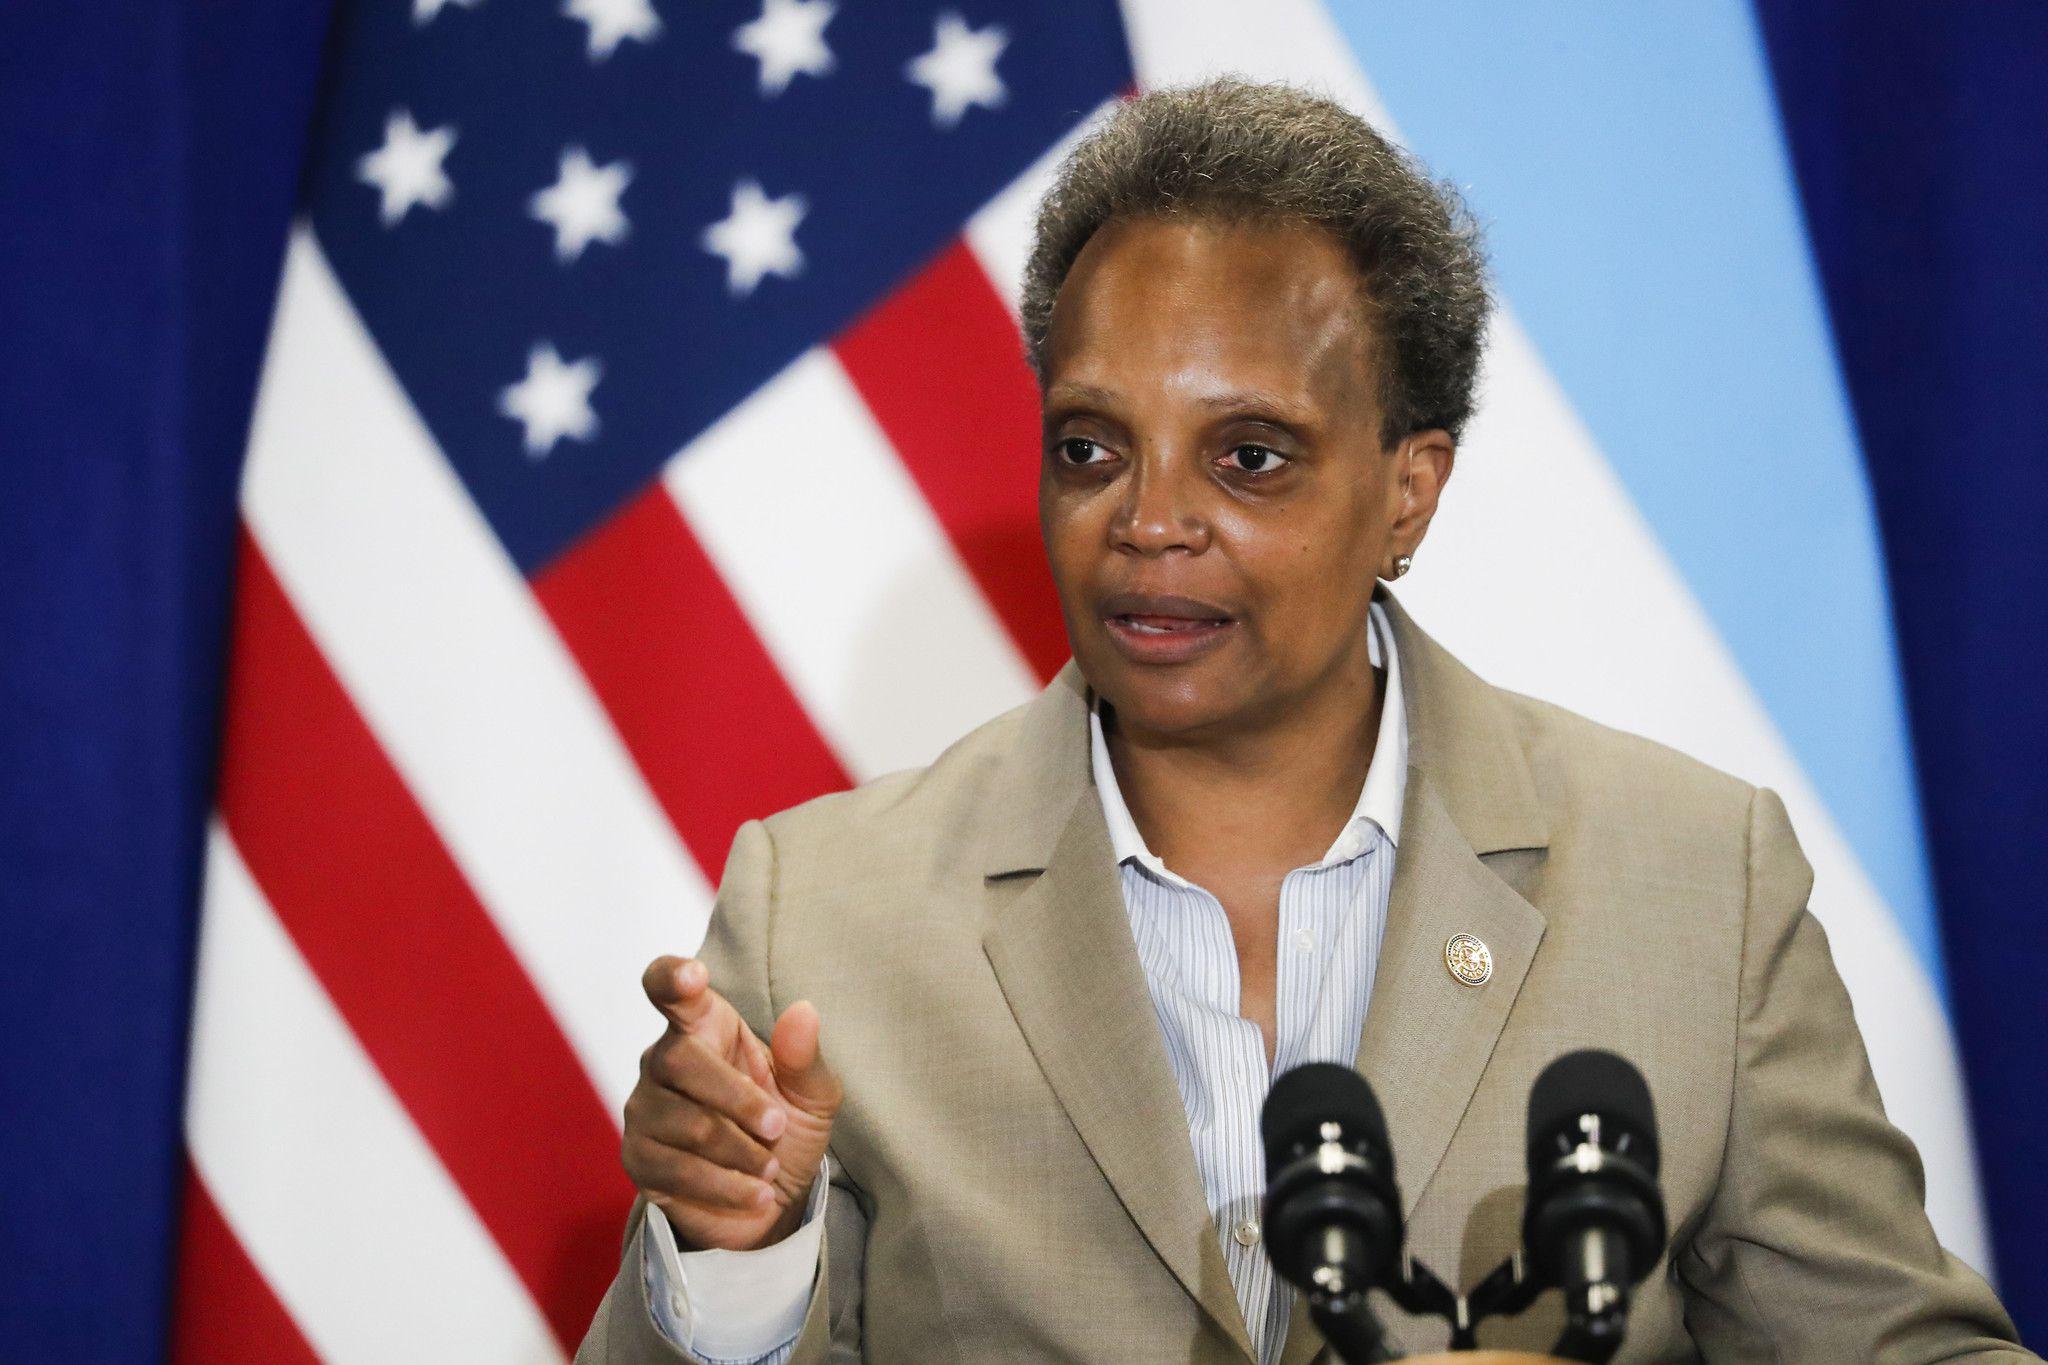 Chicago Mayor Lori Lightfoot Warns 'Karen' White House Press Sec: 'Watch Your Mouth'